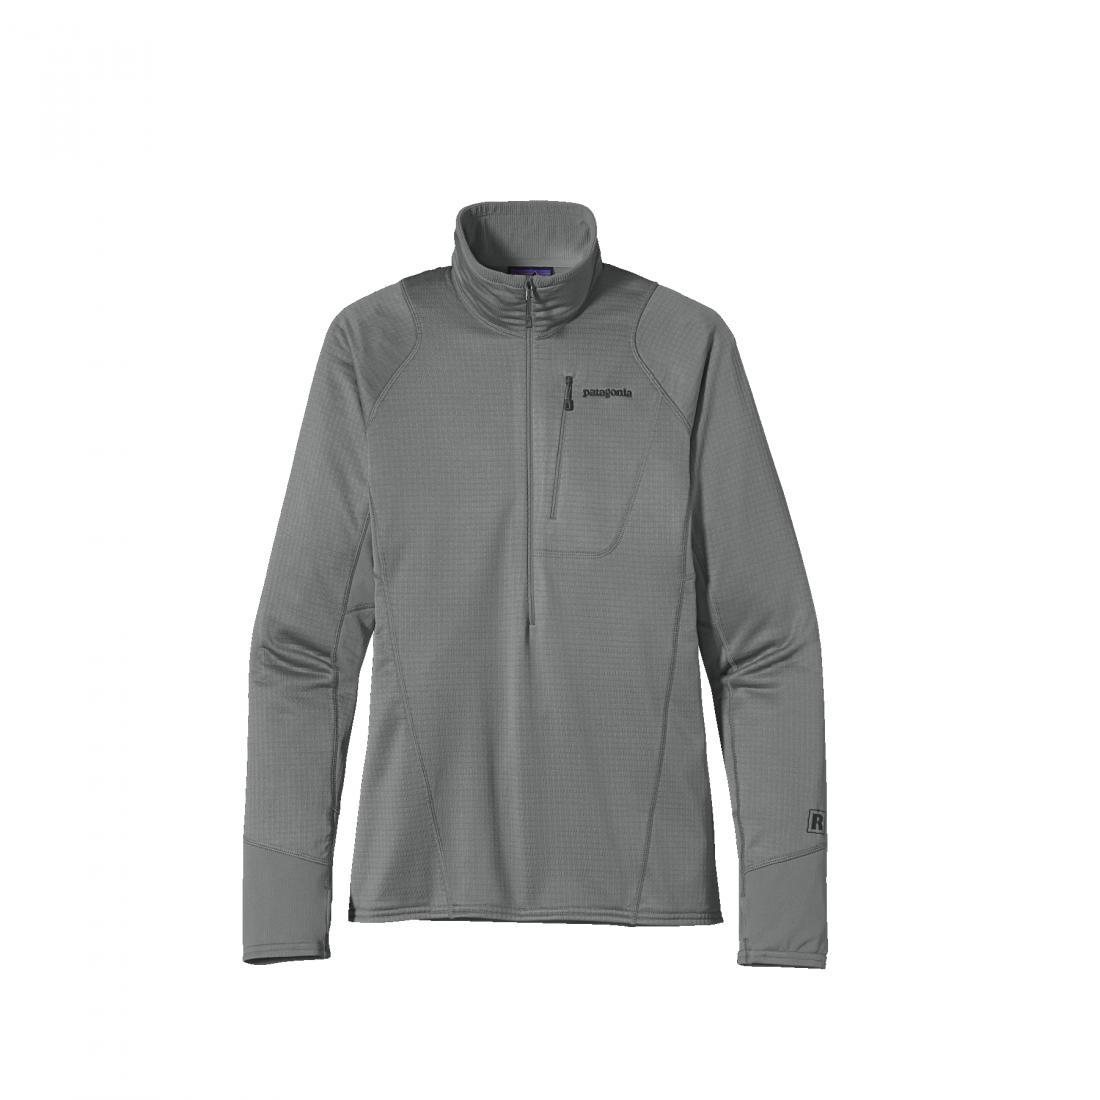 Куртка 40108 MS R1 P/OКуртки<br><br><br>Цвет: Темно-серый<br>Размер: L